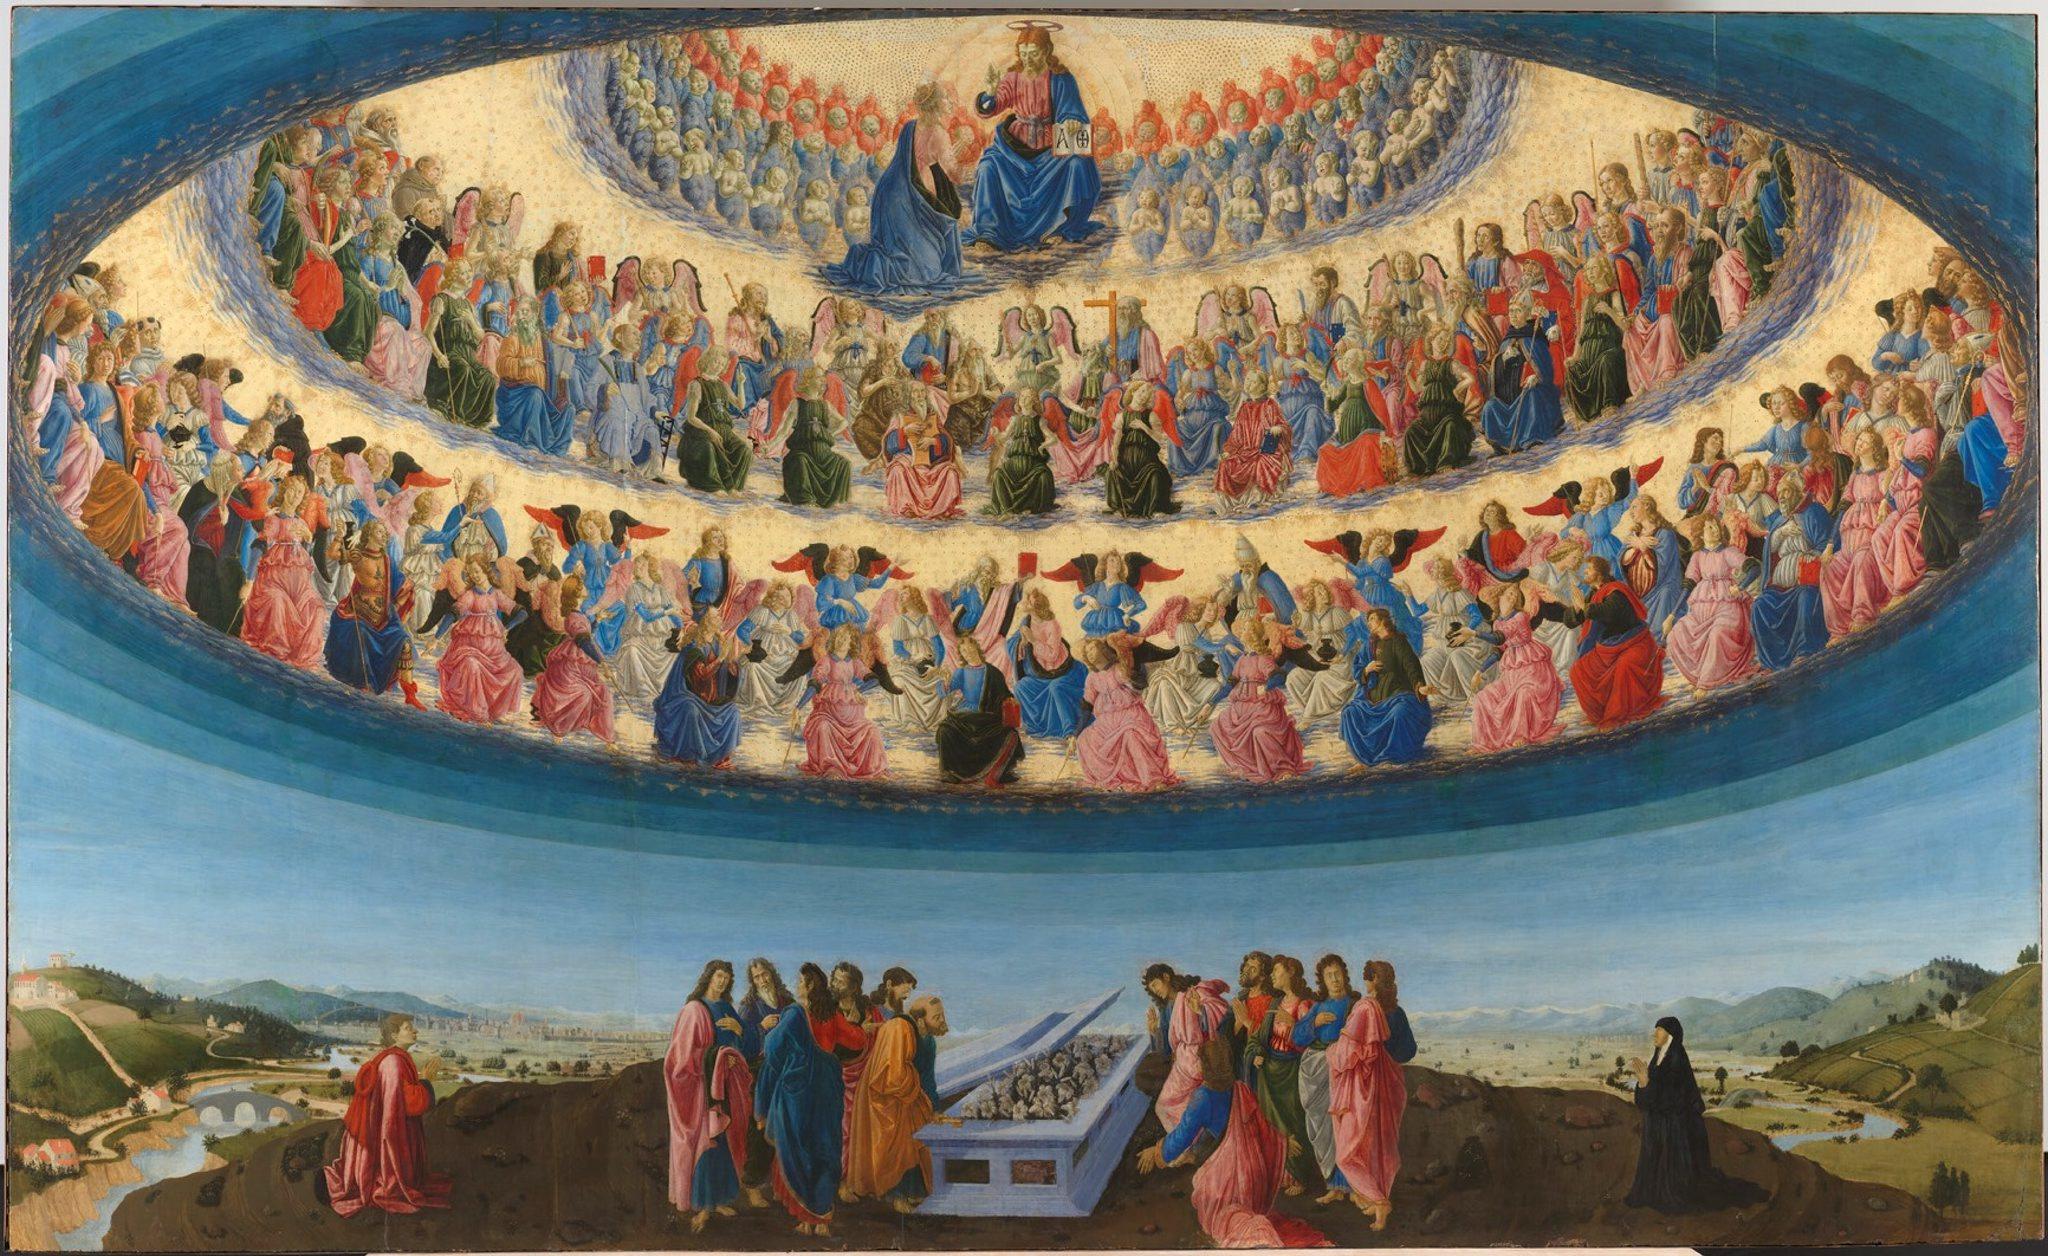 Visions of Paradise: Botticini's Palmieri Altarpiece